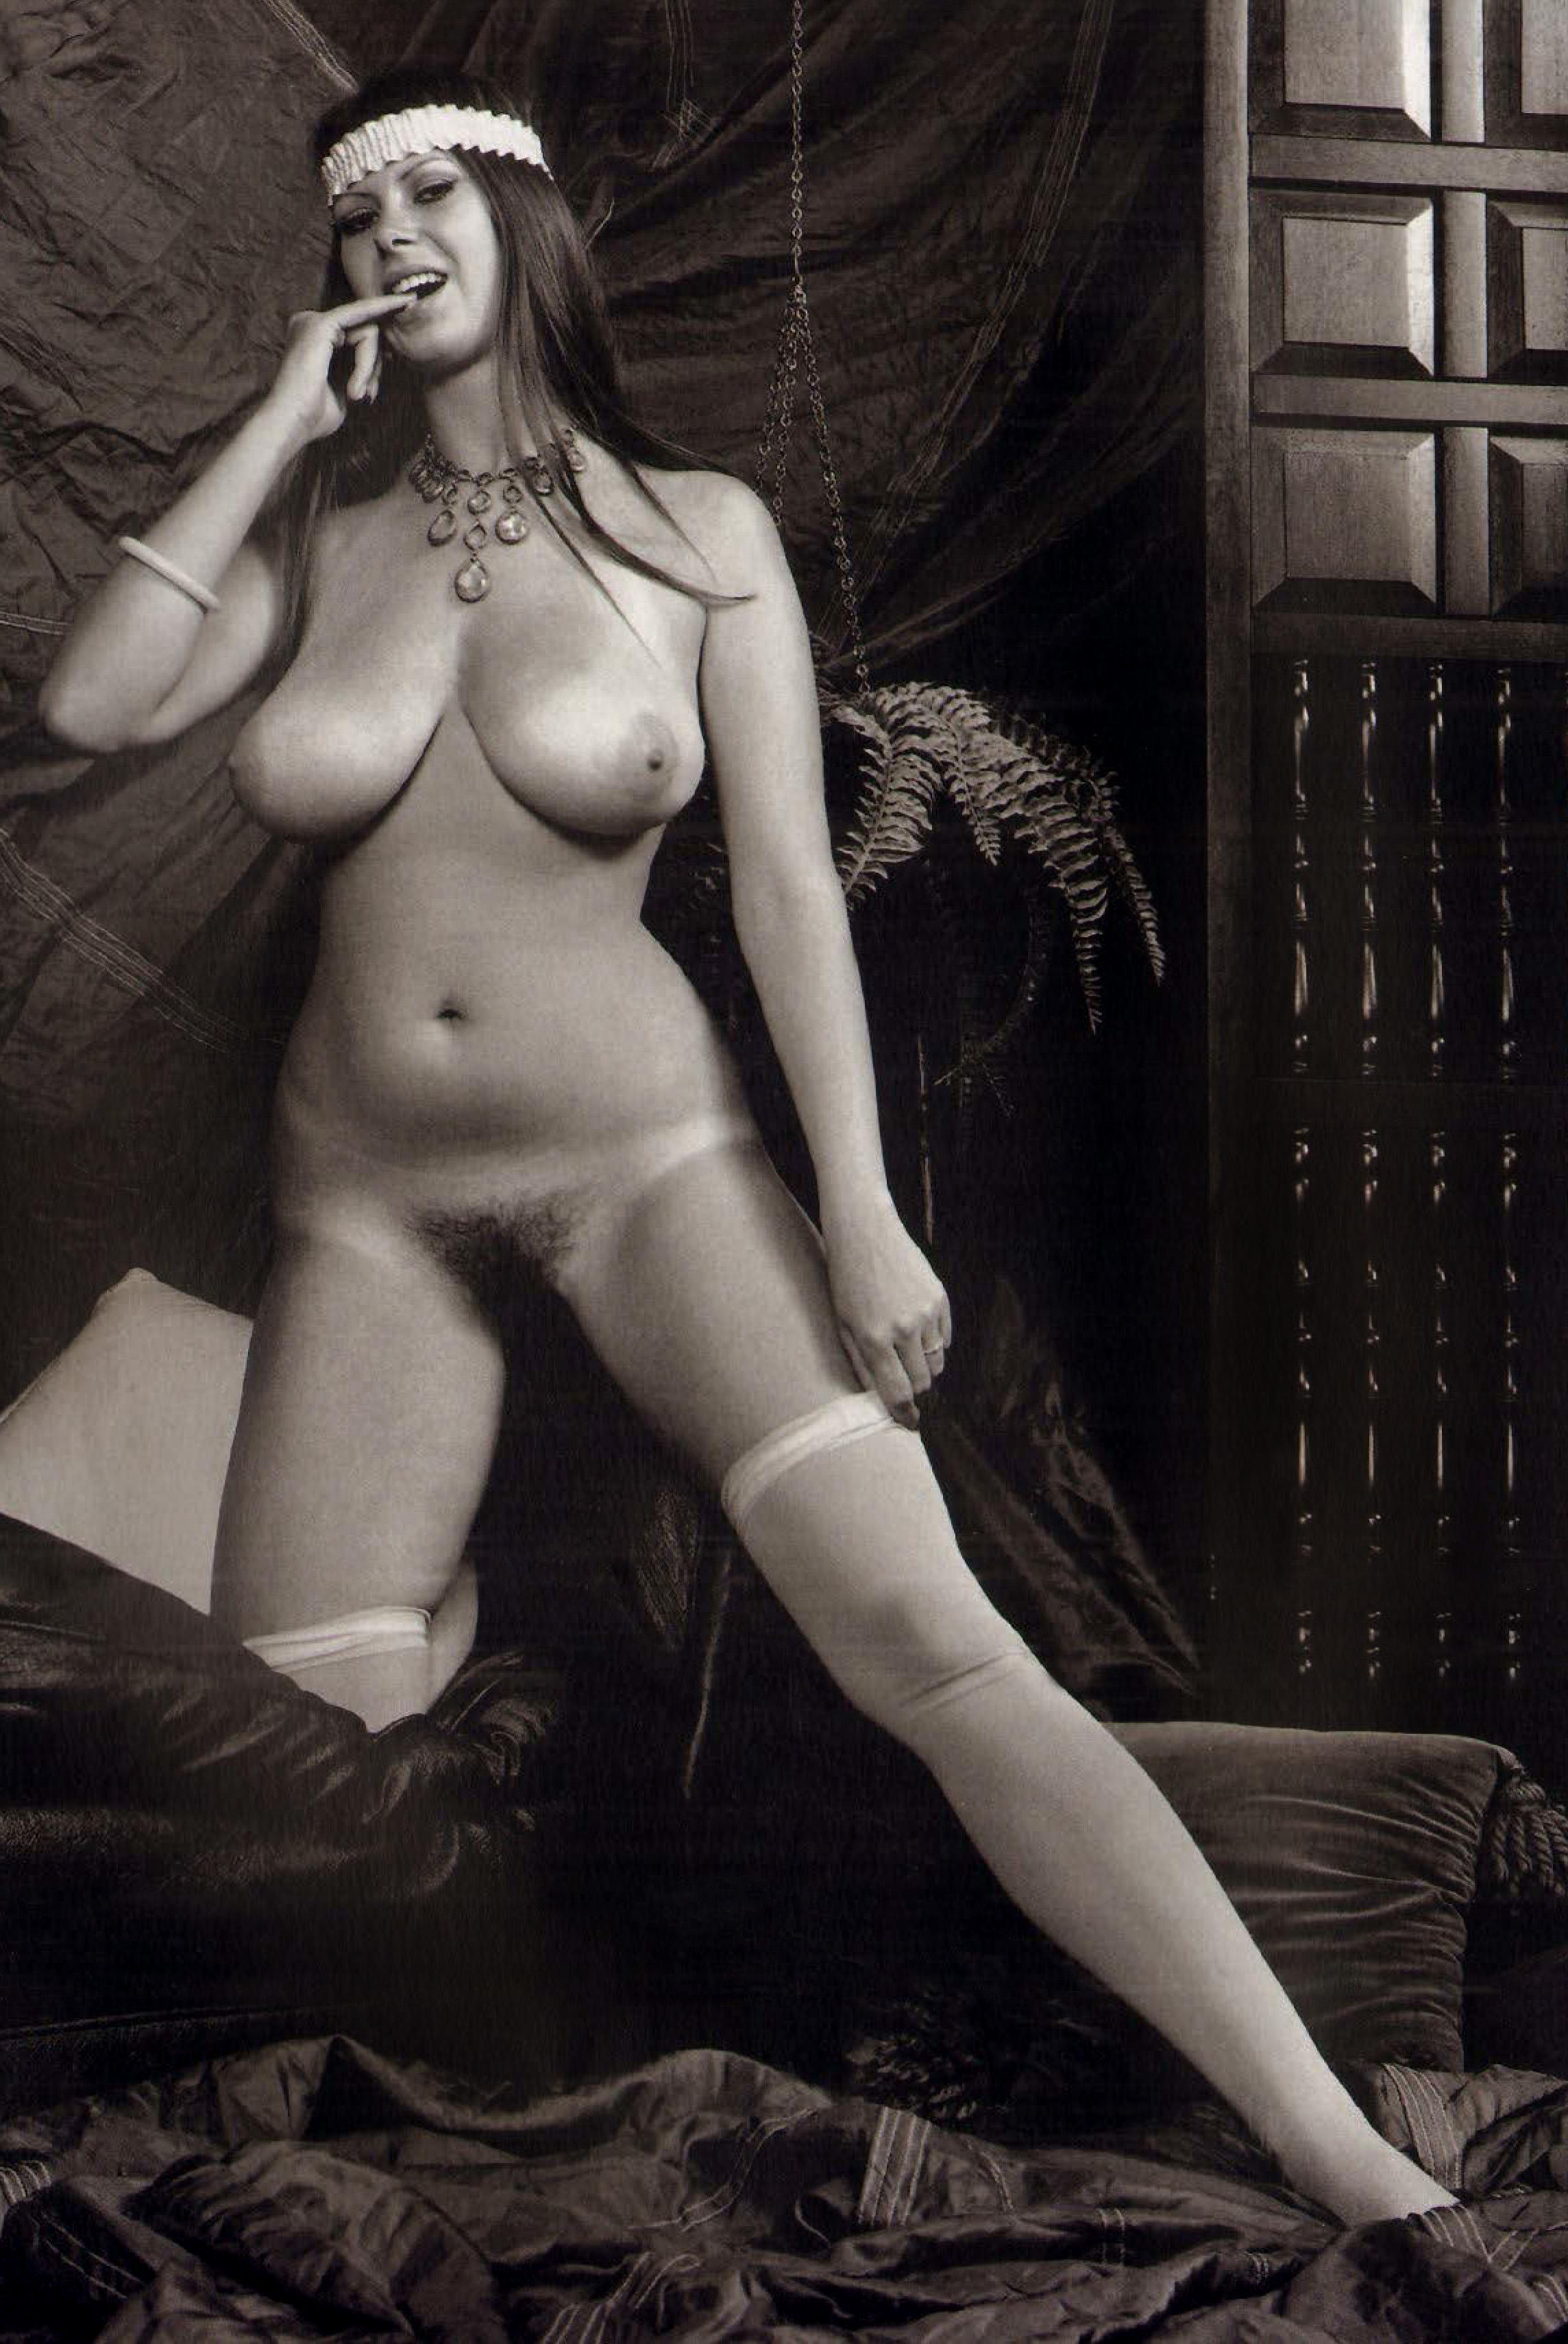 Uncensored miley cyrus nude pics